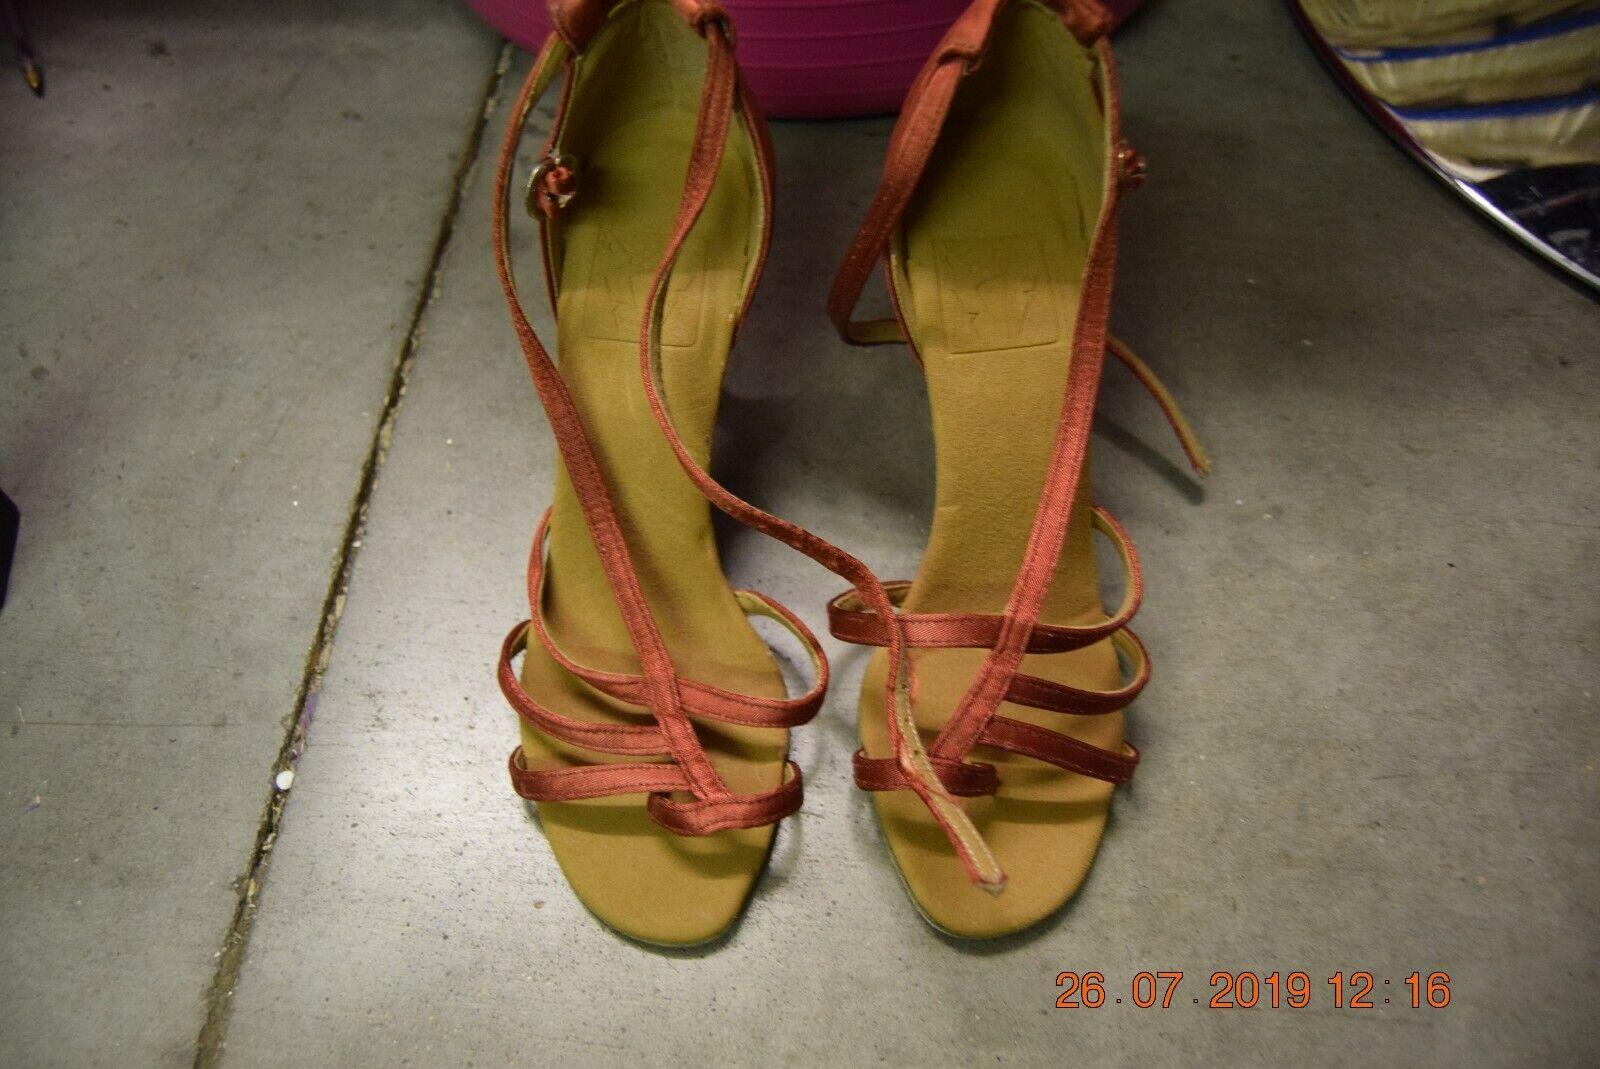 Dark Red satin Dancelife ballroom / latin dance shoes - size UK 3.5 (P35)